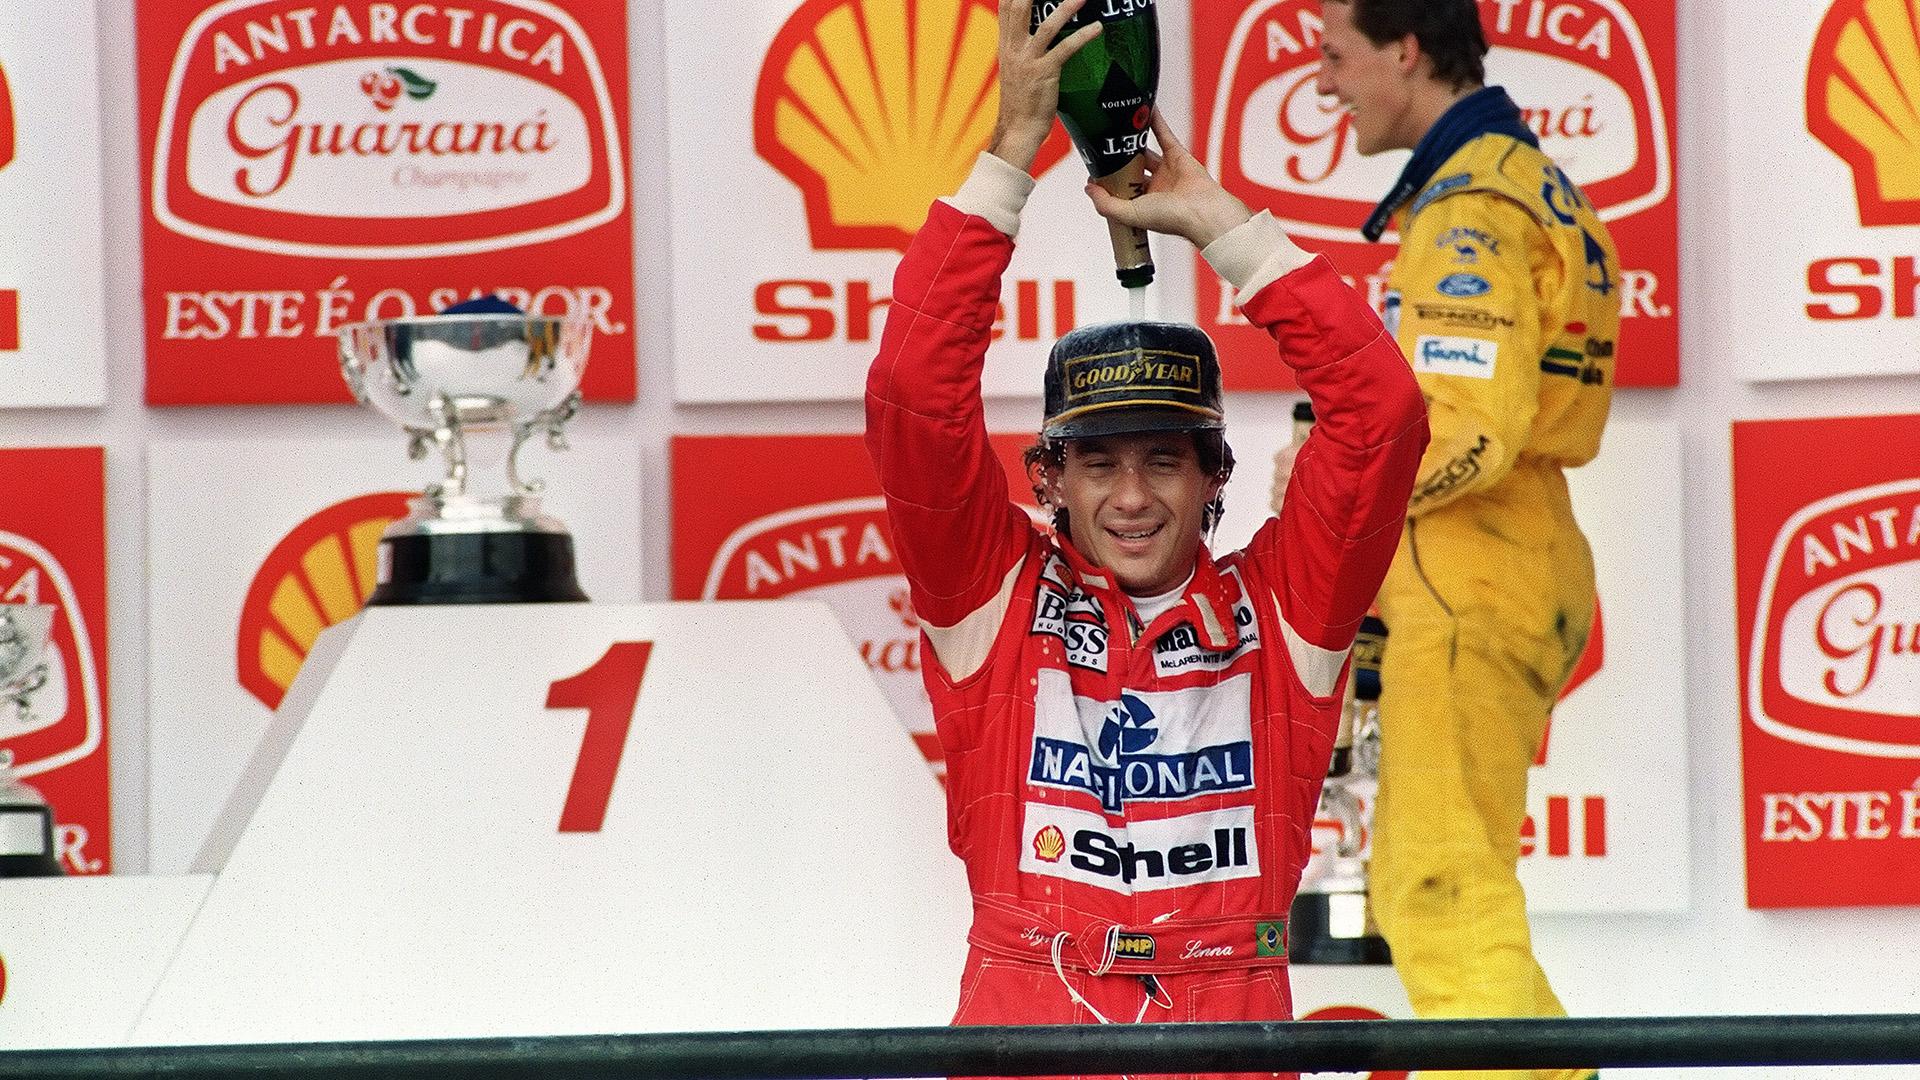 Ayrton Senna Corinthians Football Formula One